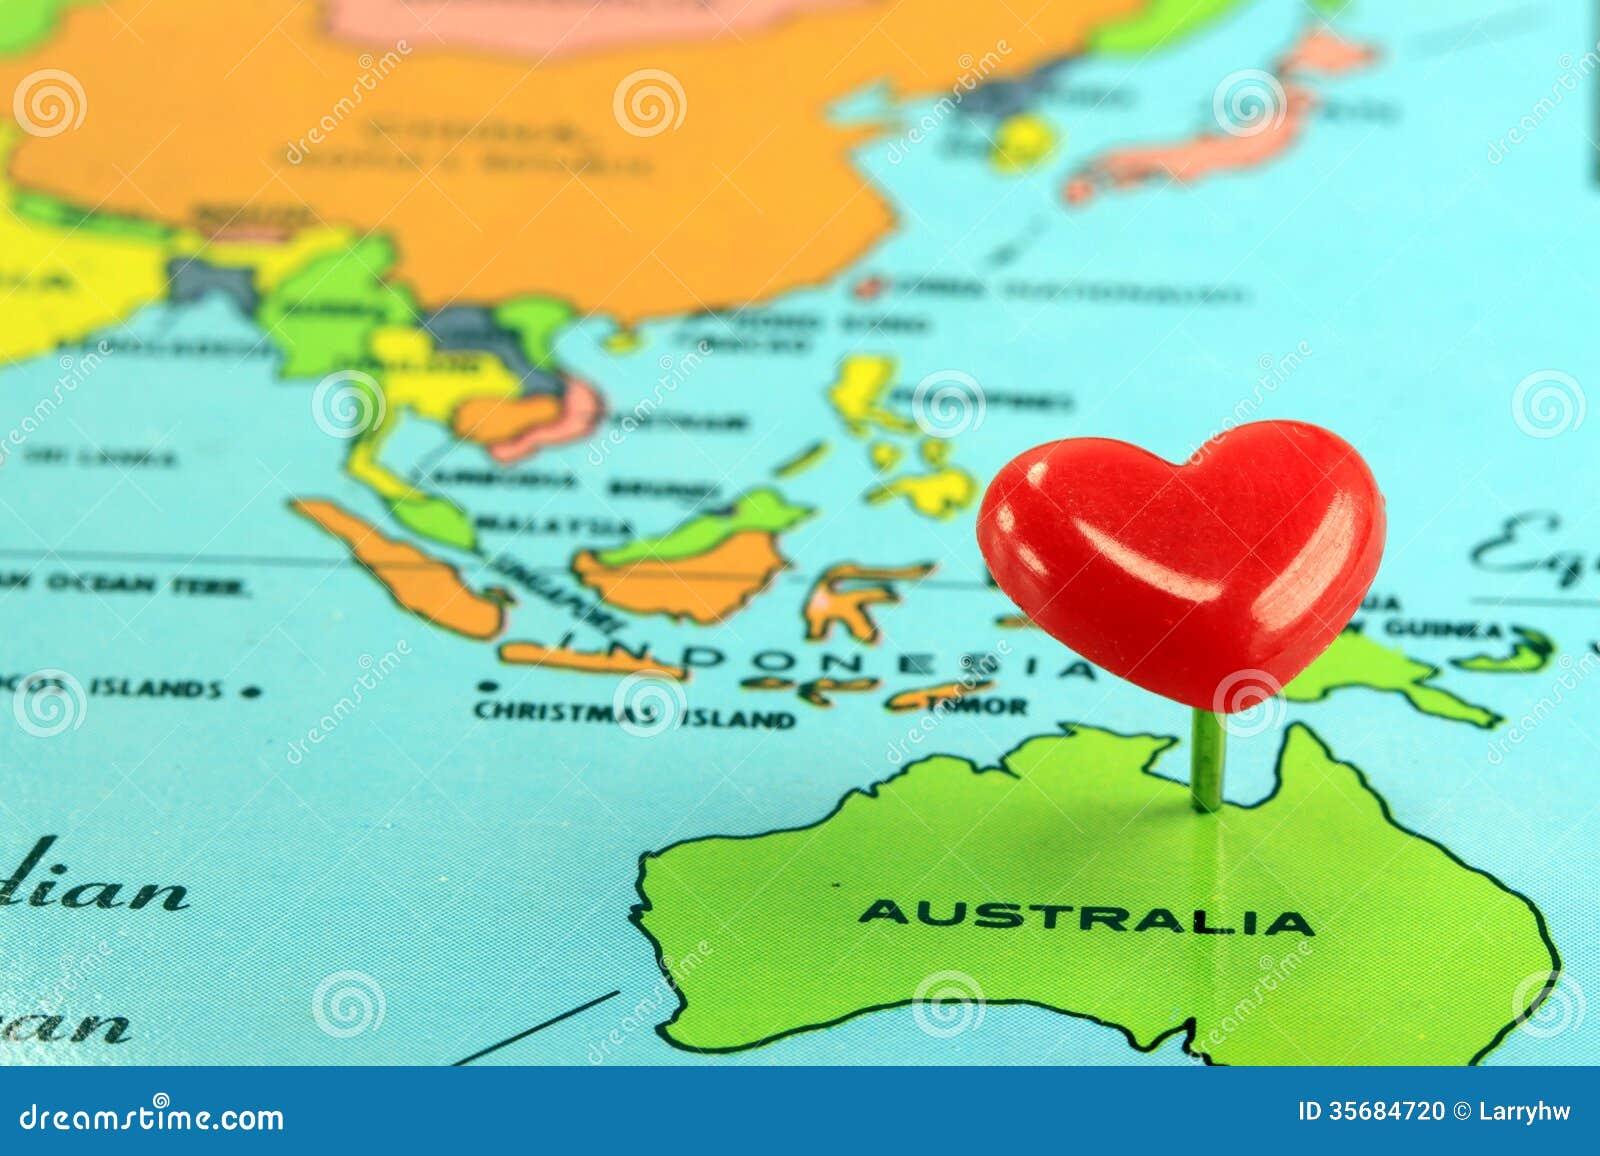 stereotype map of australia